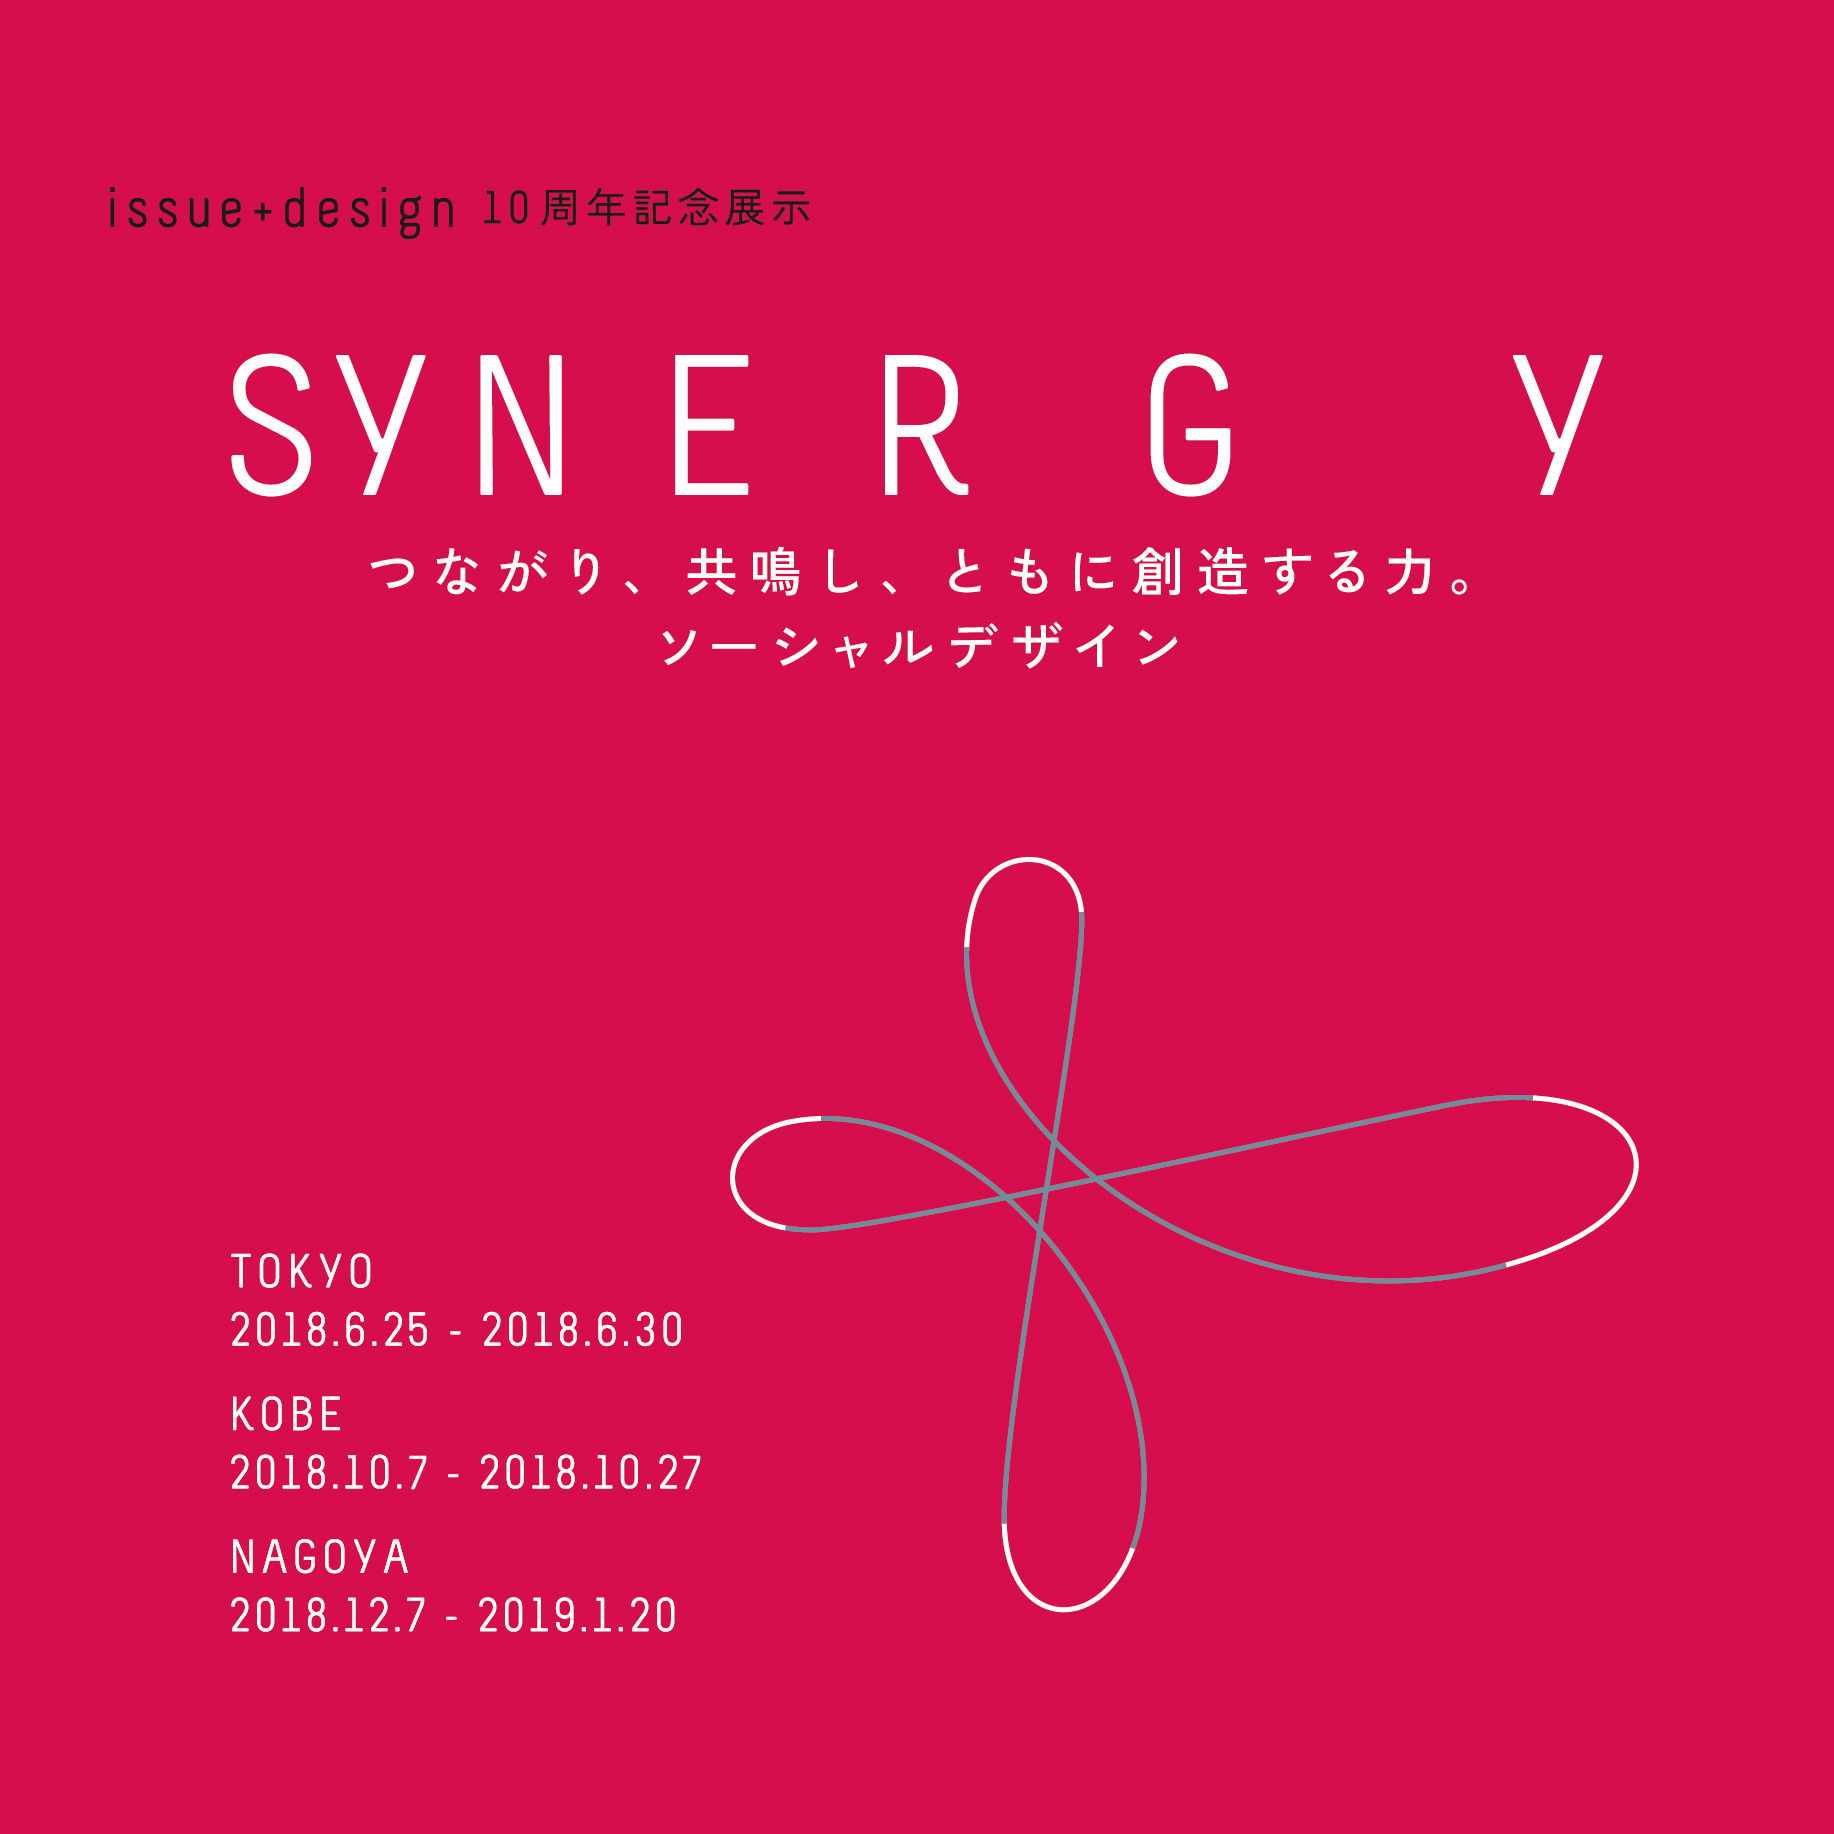 issue+design 10周年記念展示 SYNERGY